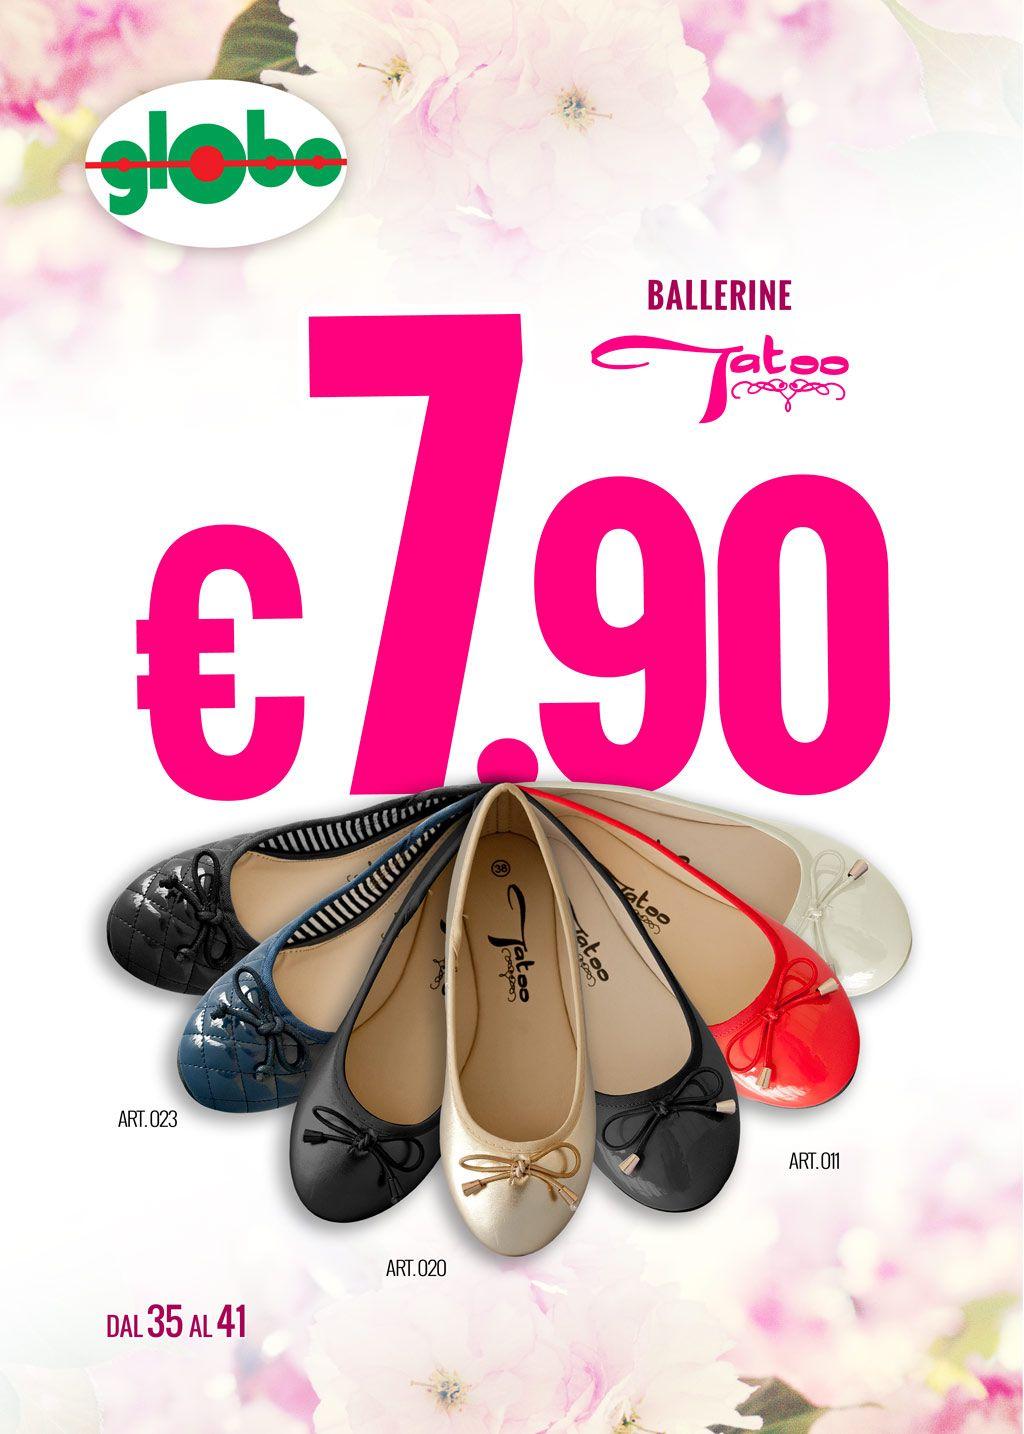 Nuovissime Ballerine Tatoo a solo € 7.90 !!